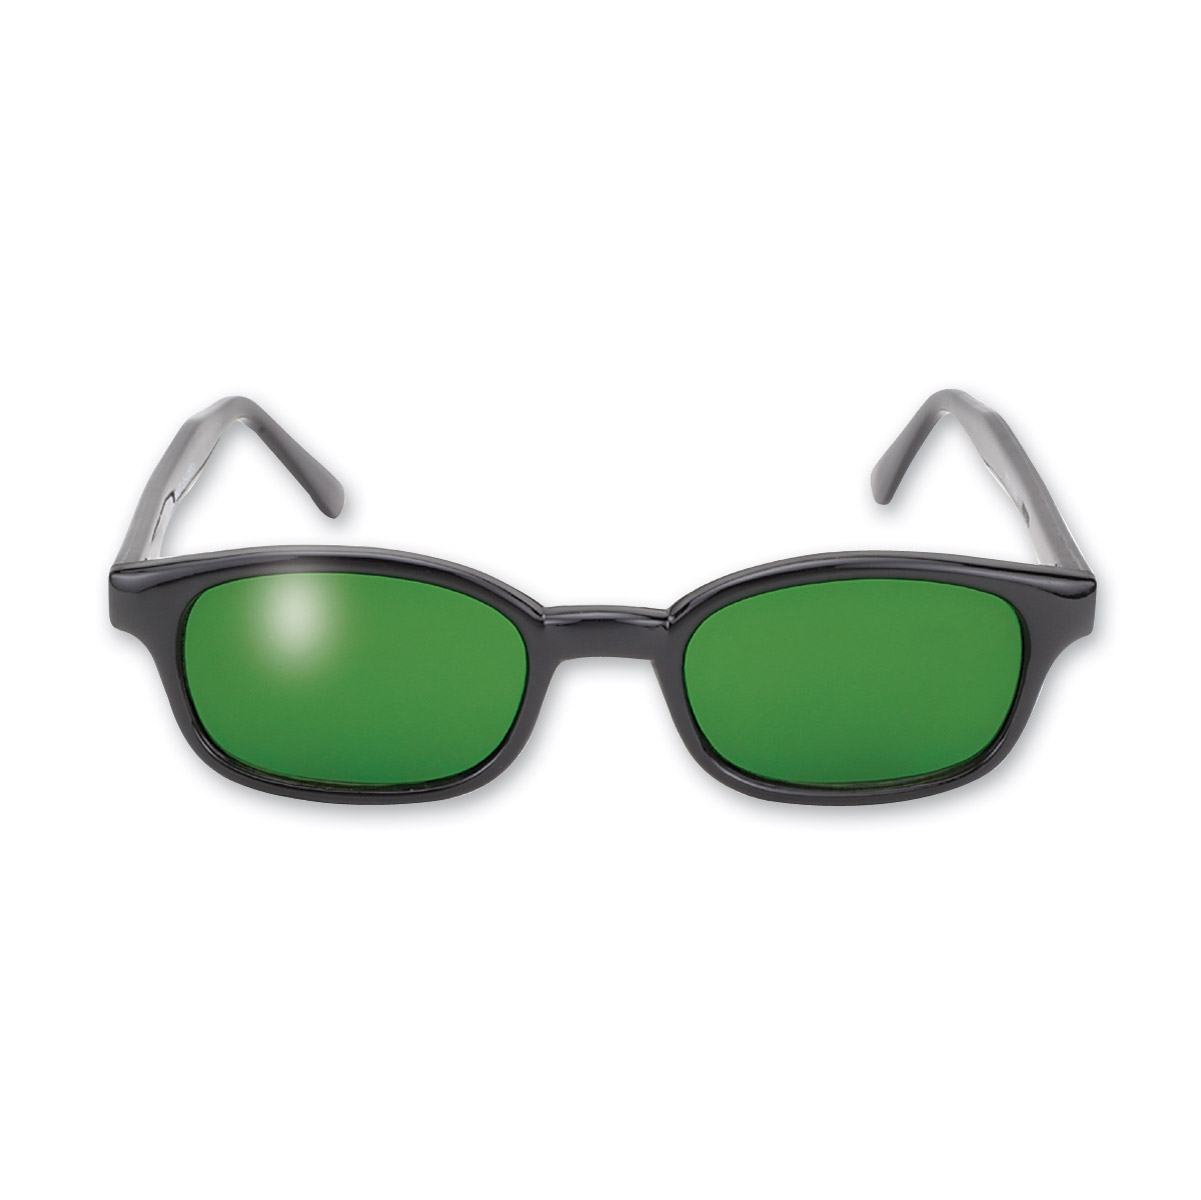 KD's Sunglasses - Black Frame with Dark Green Lens